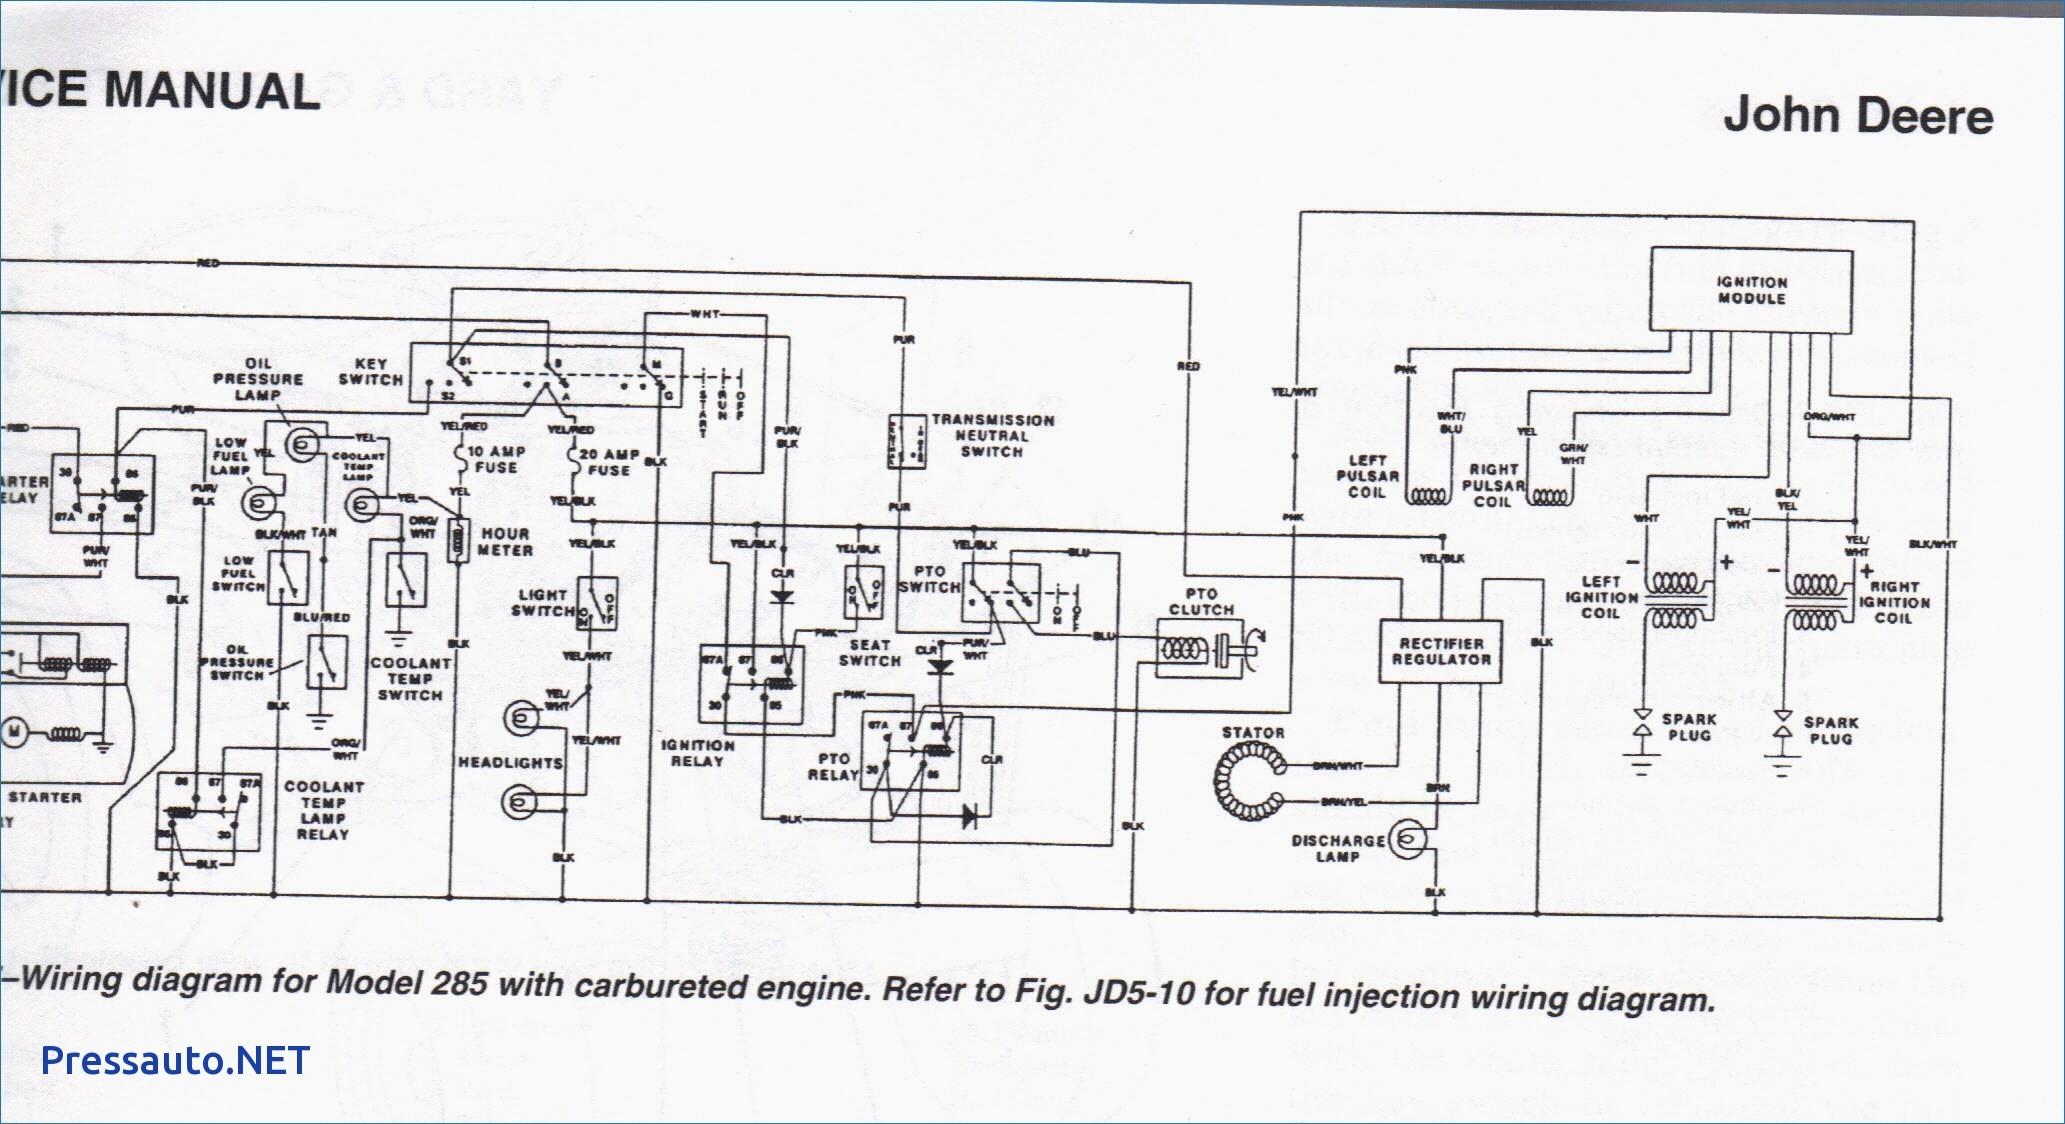 wiring diagram for john deere 730